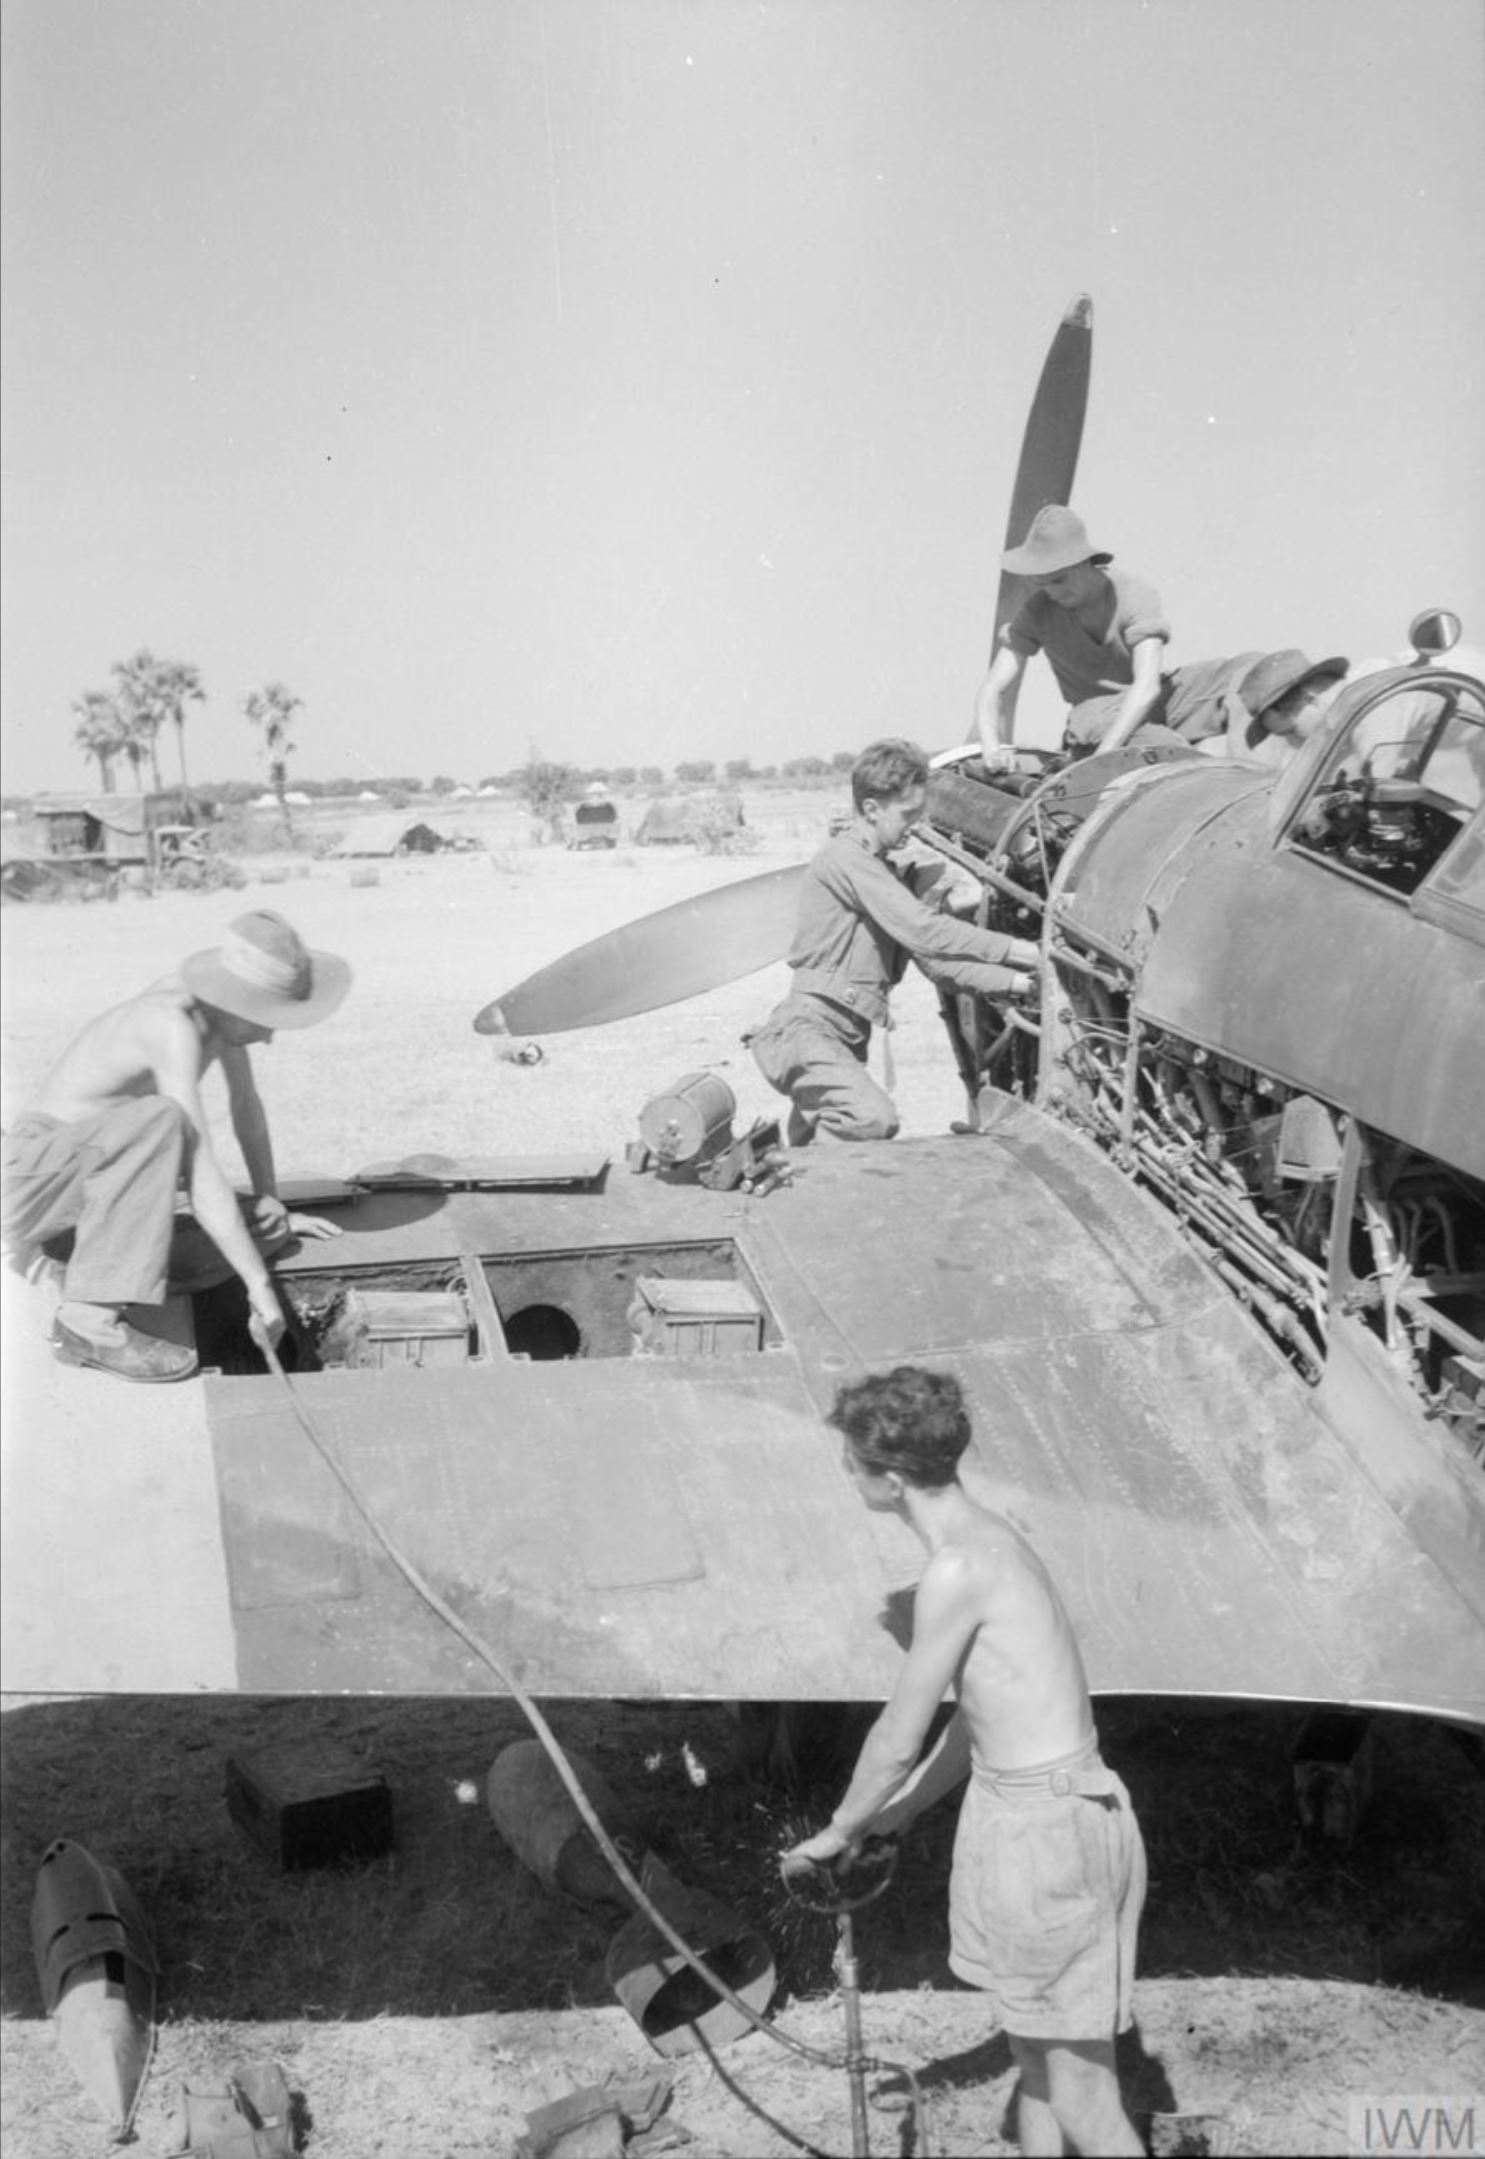 Hurricane IV RAF 170 Wing dispersal area Burma IWM CF352